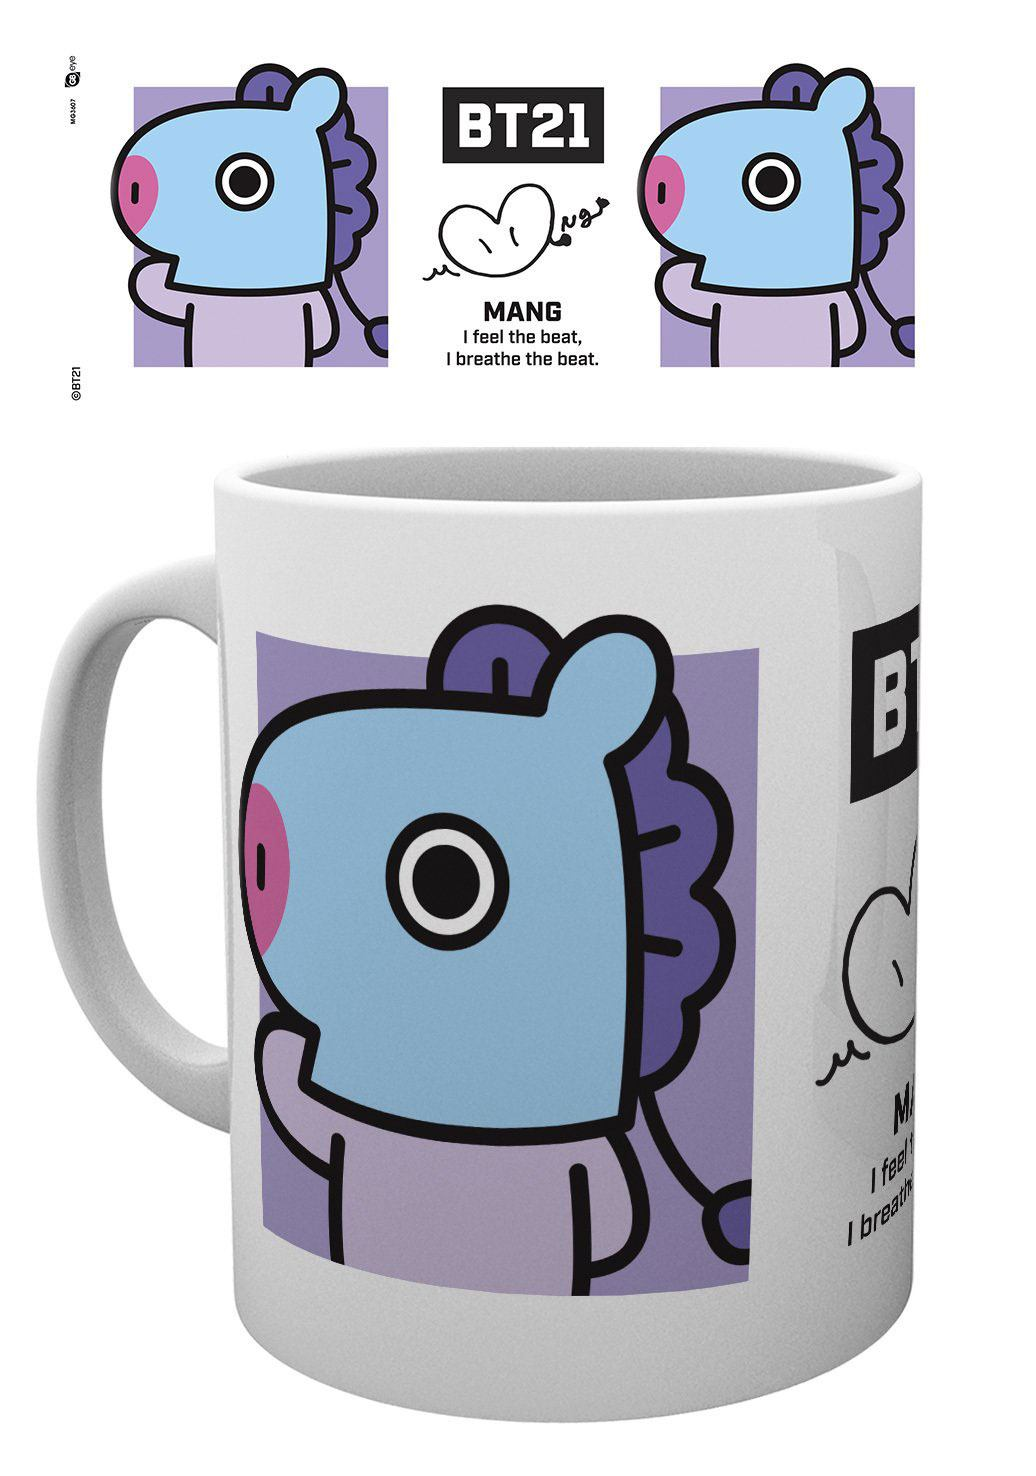 BT21 Mug Mang